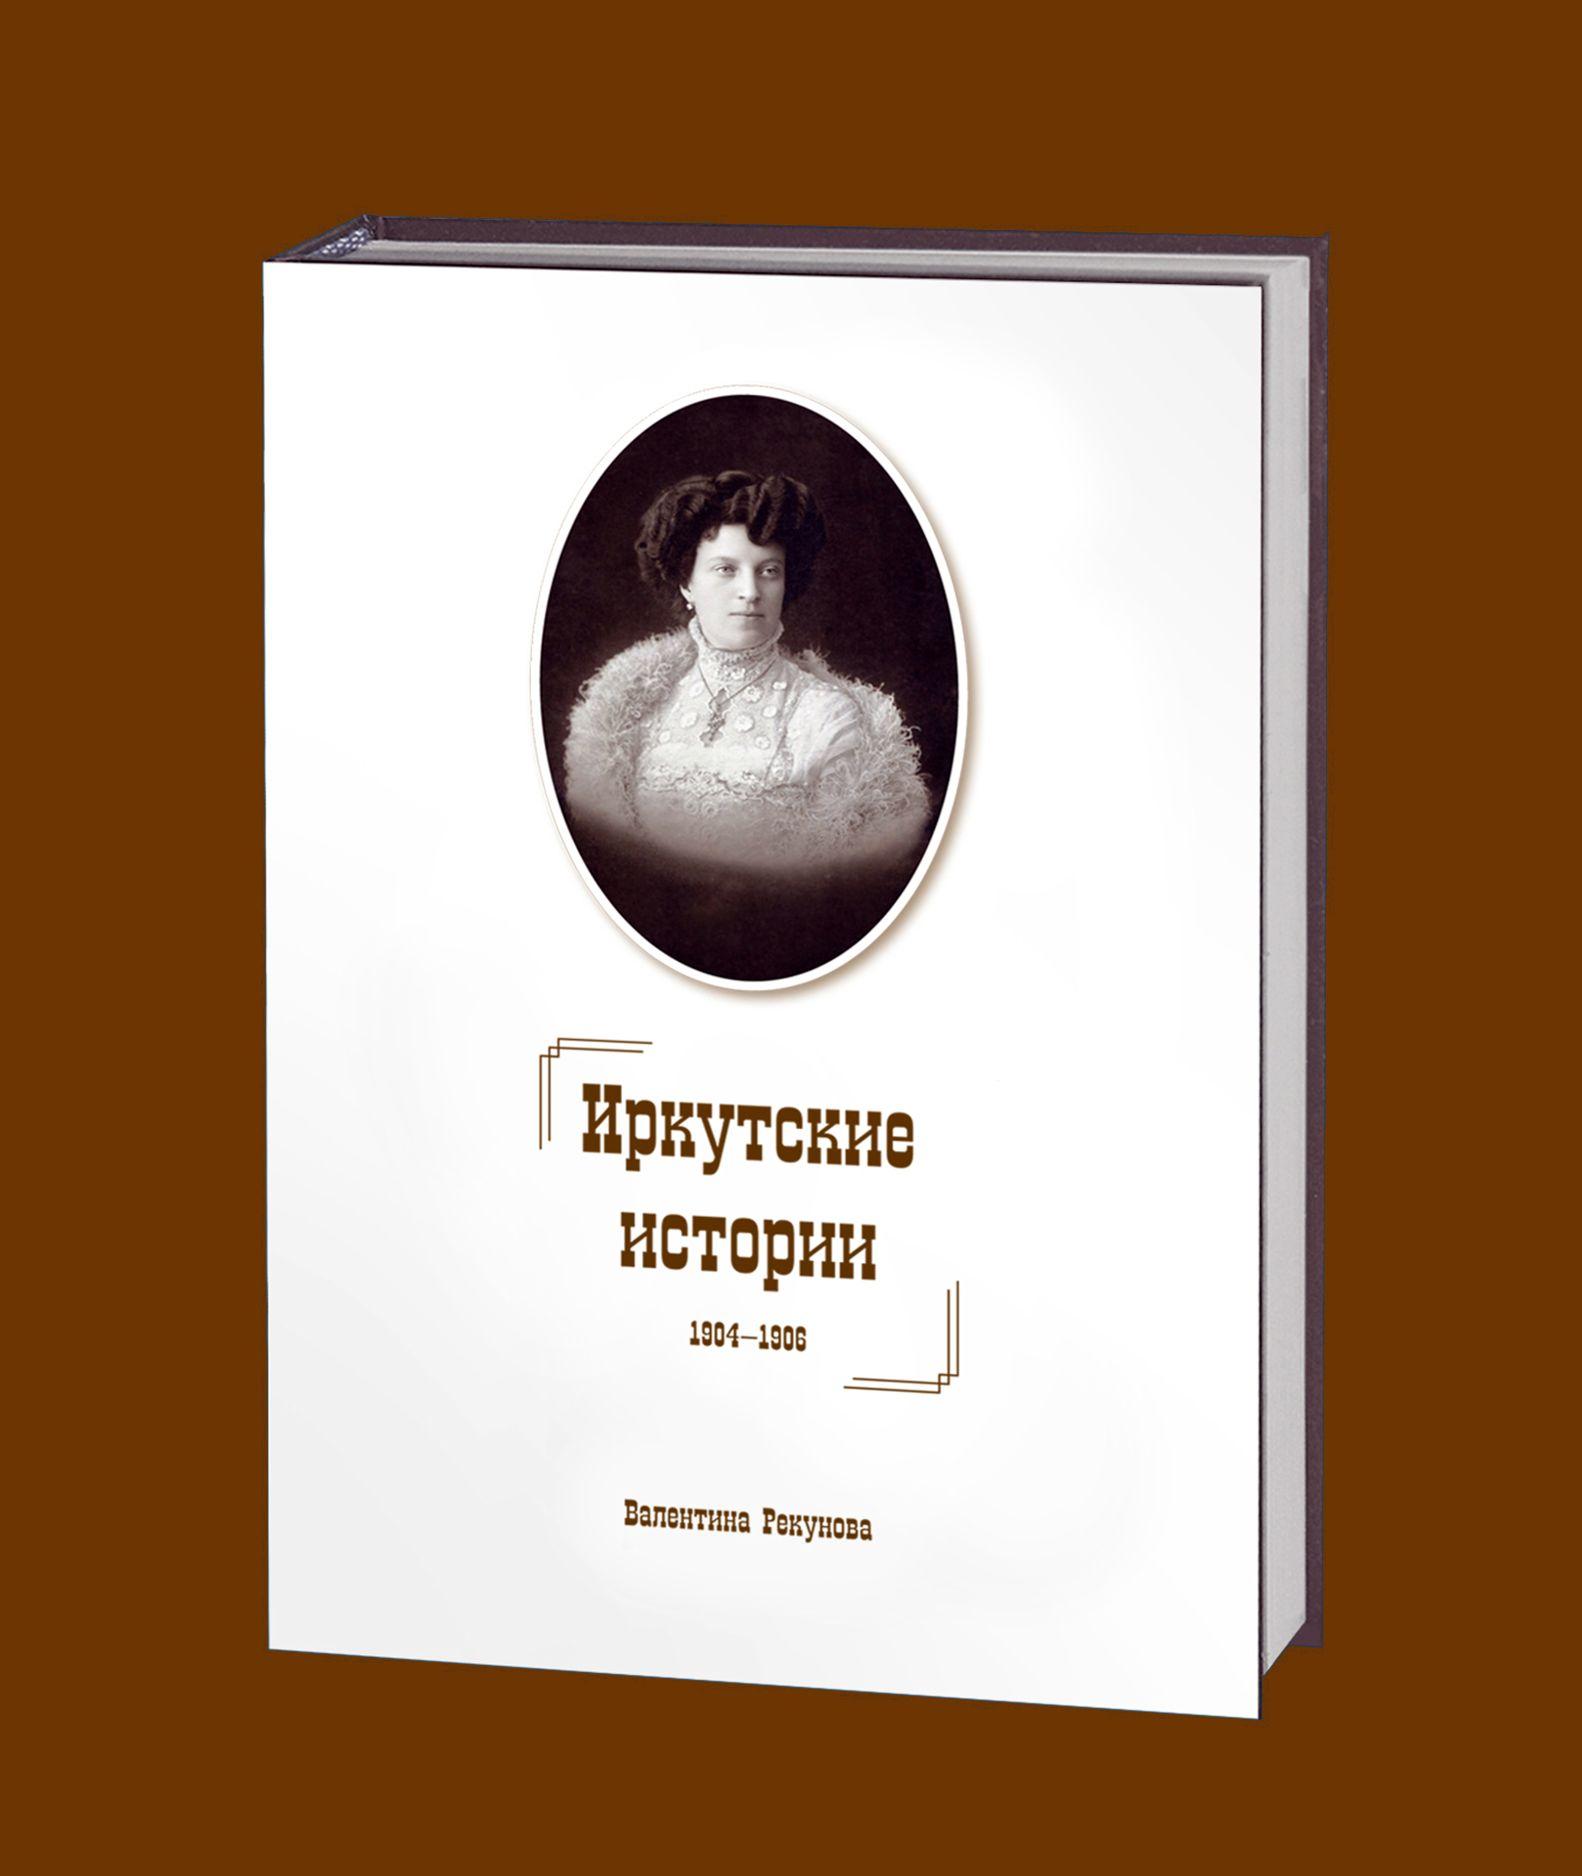 Иркутские истории, 1904-1906